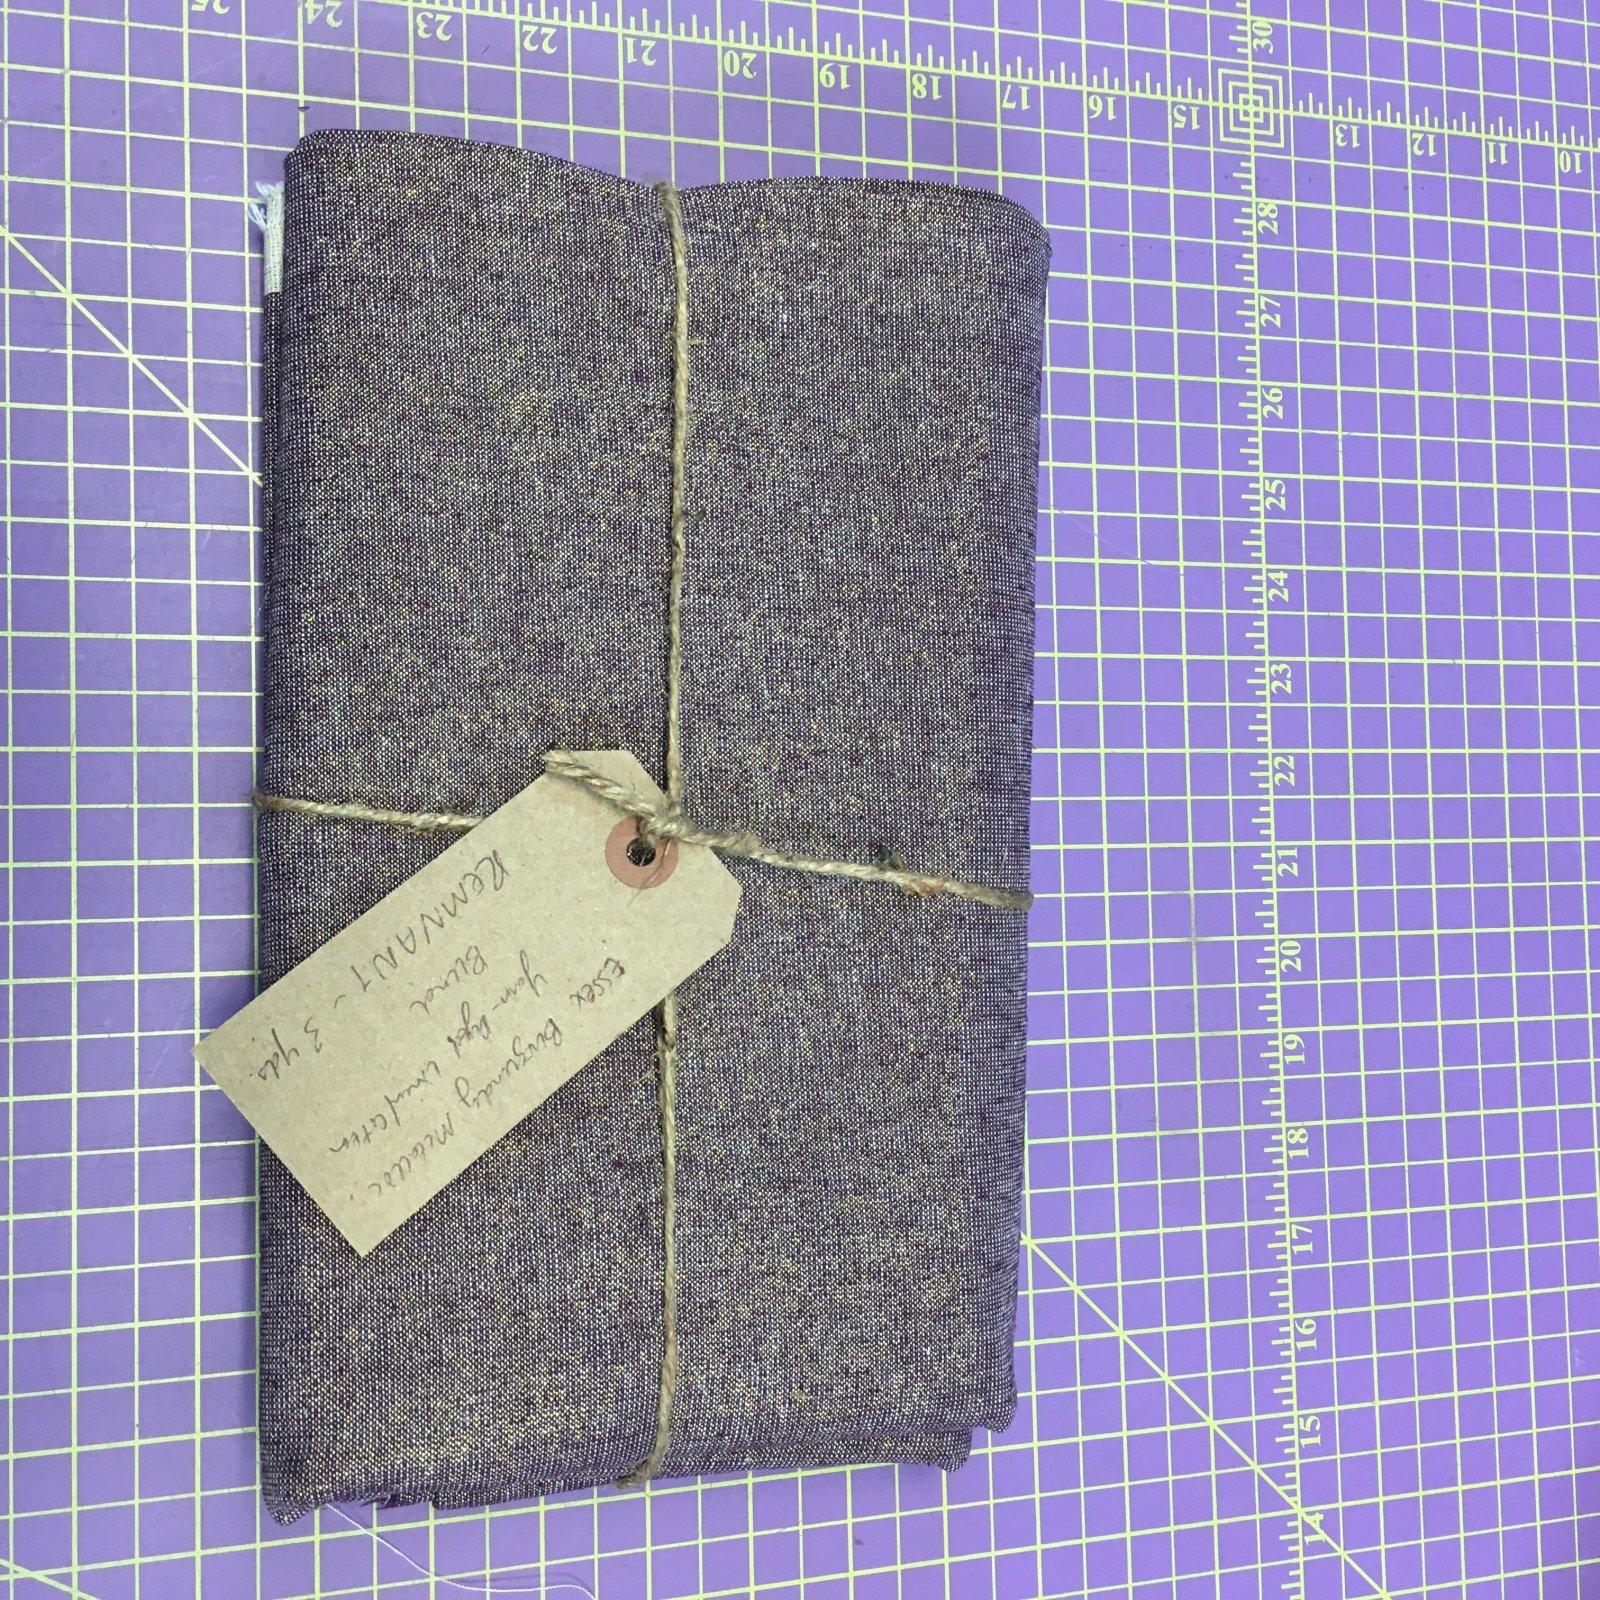 Fabric Essex Burgundy Metallic Yarn-Dyed Linen/Cotton Blend REMNANT - 3 Yards